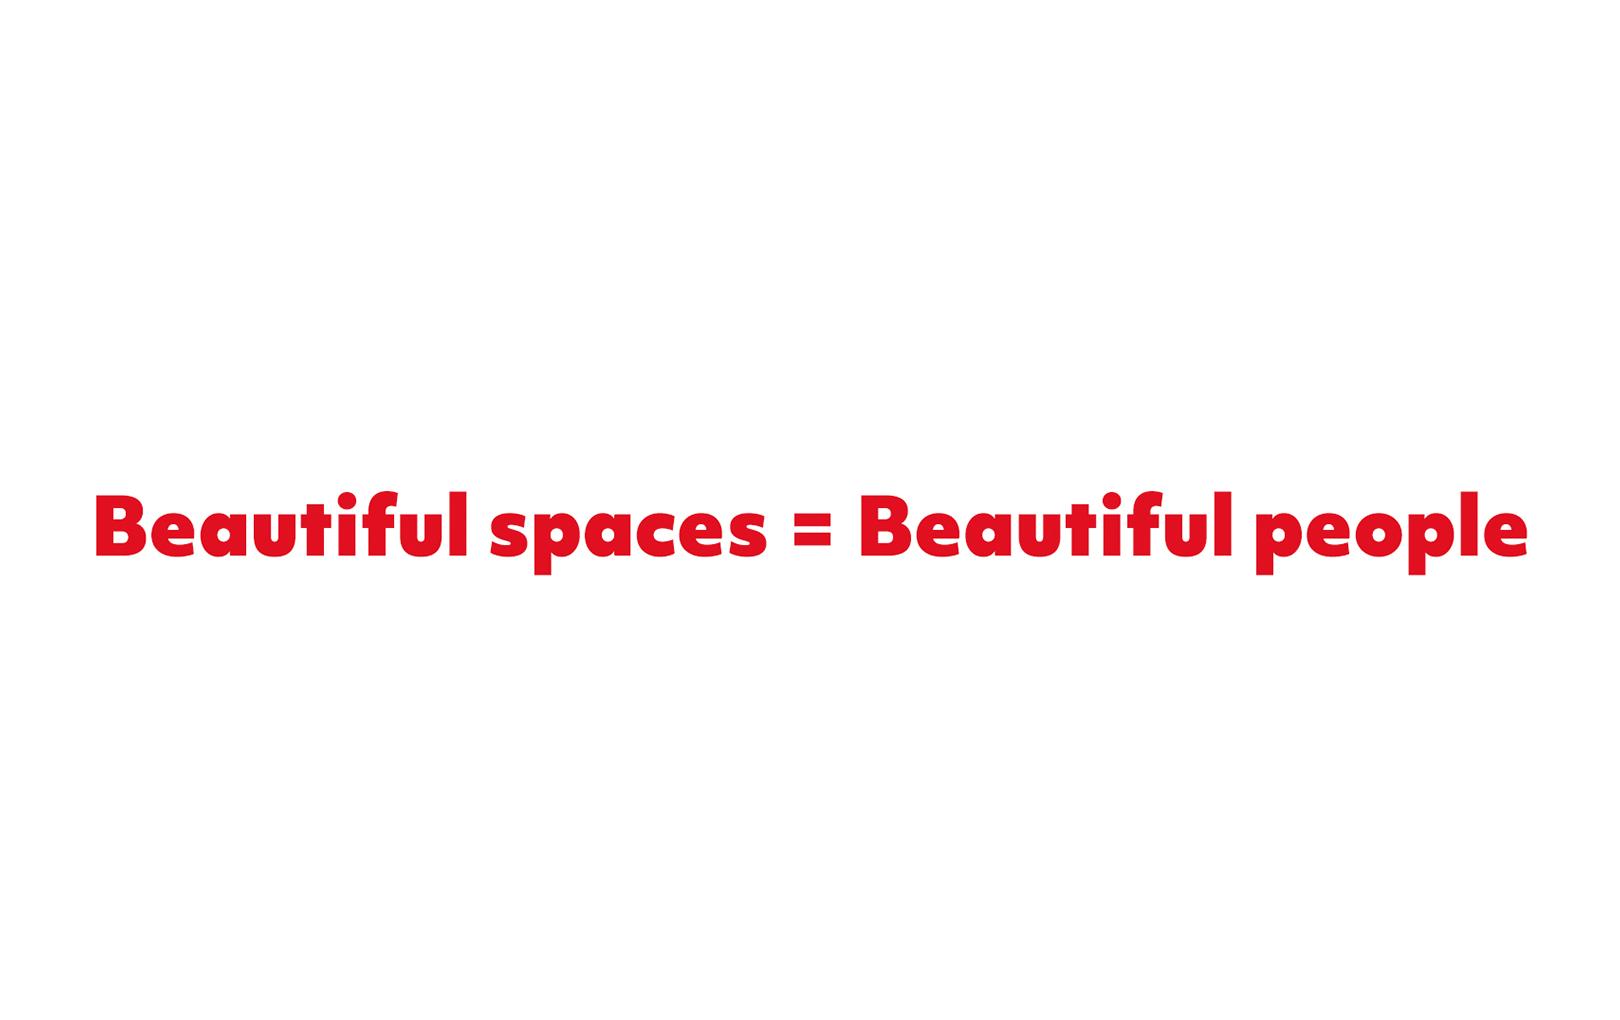 Beautiful spaces = Beautiful people - Piquant Media, Limerick City